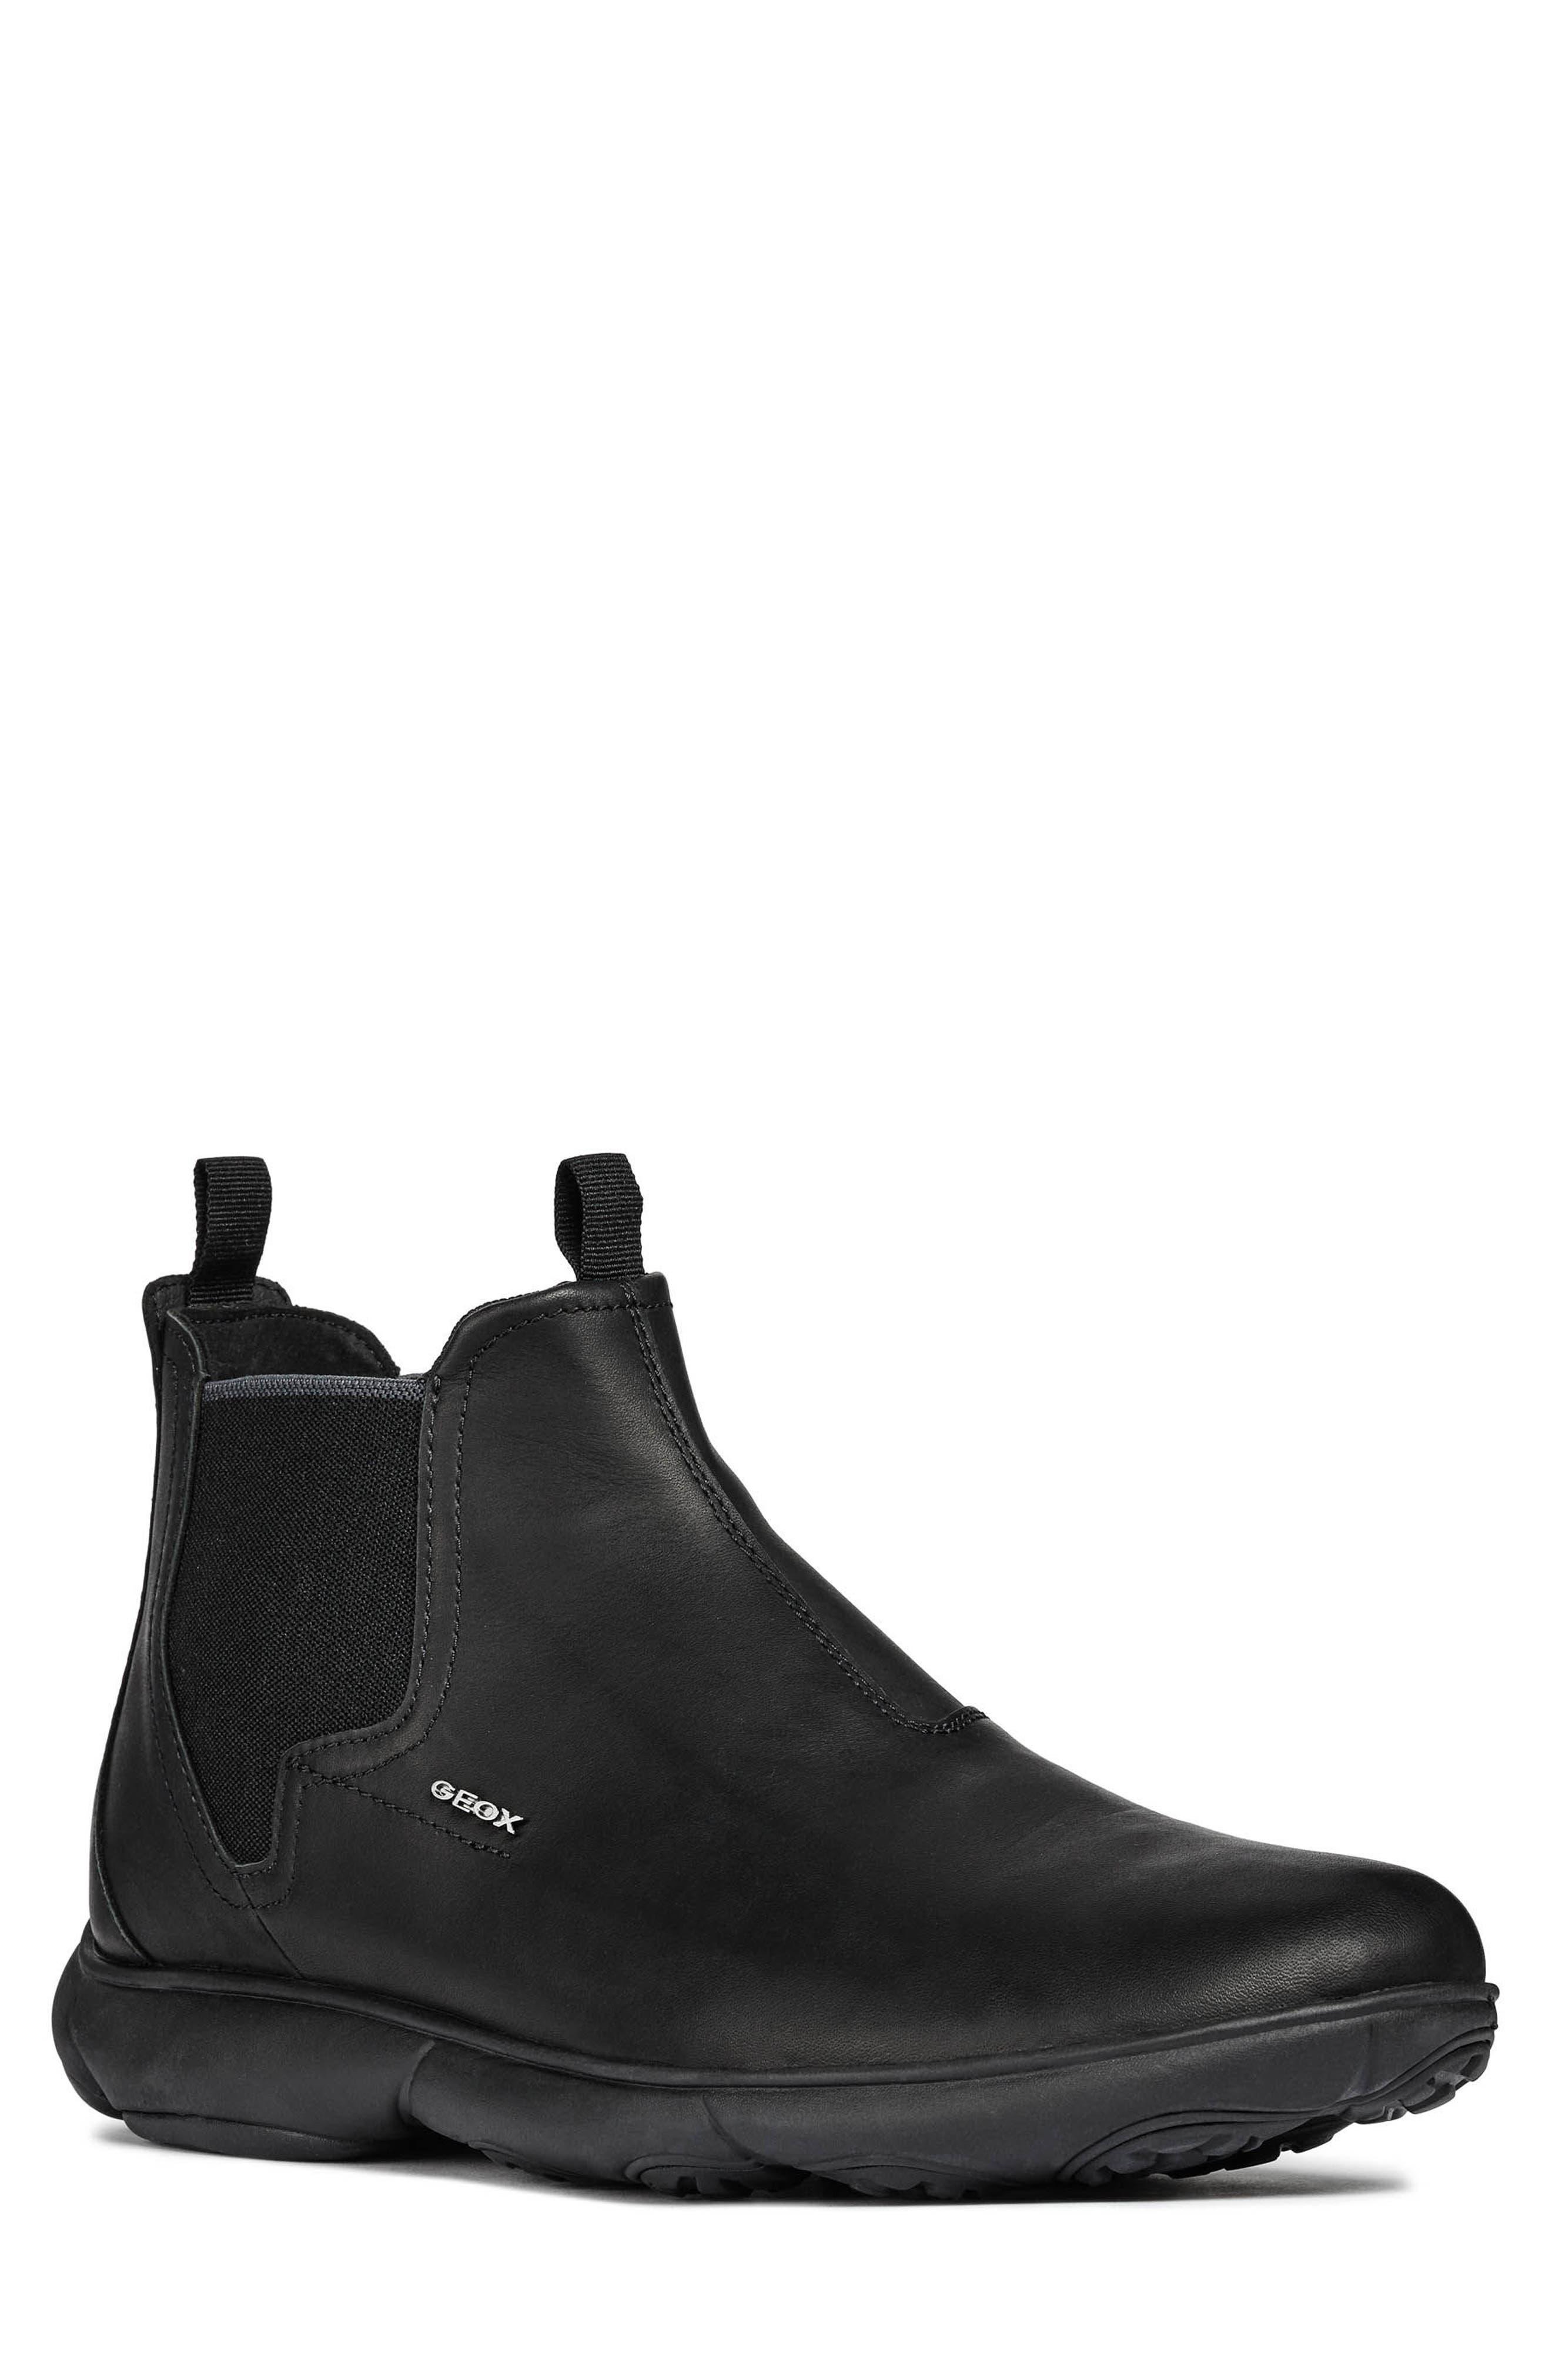 Nebula Mid Chelsea Sneaker,                         Main,                         color, BLACK LEATHER